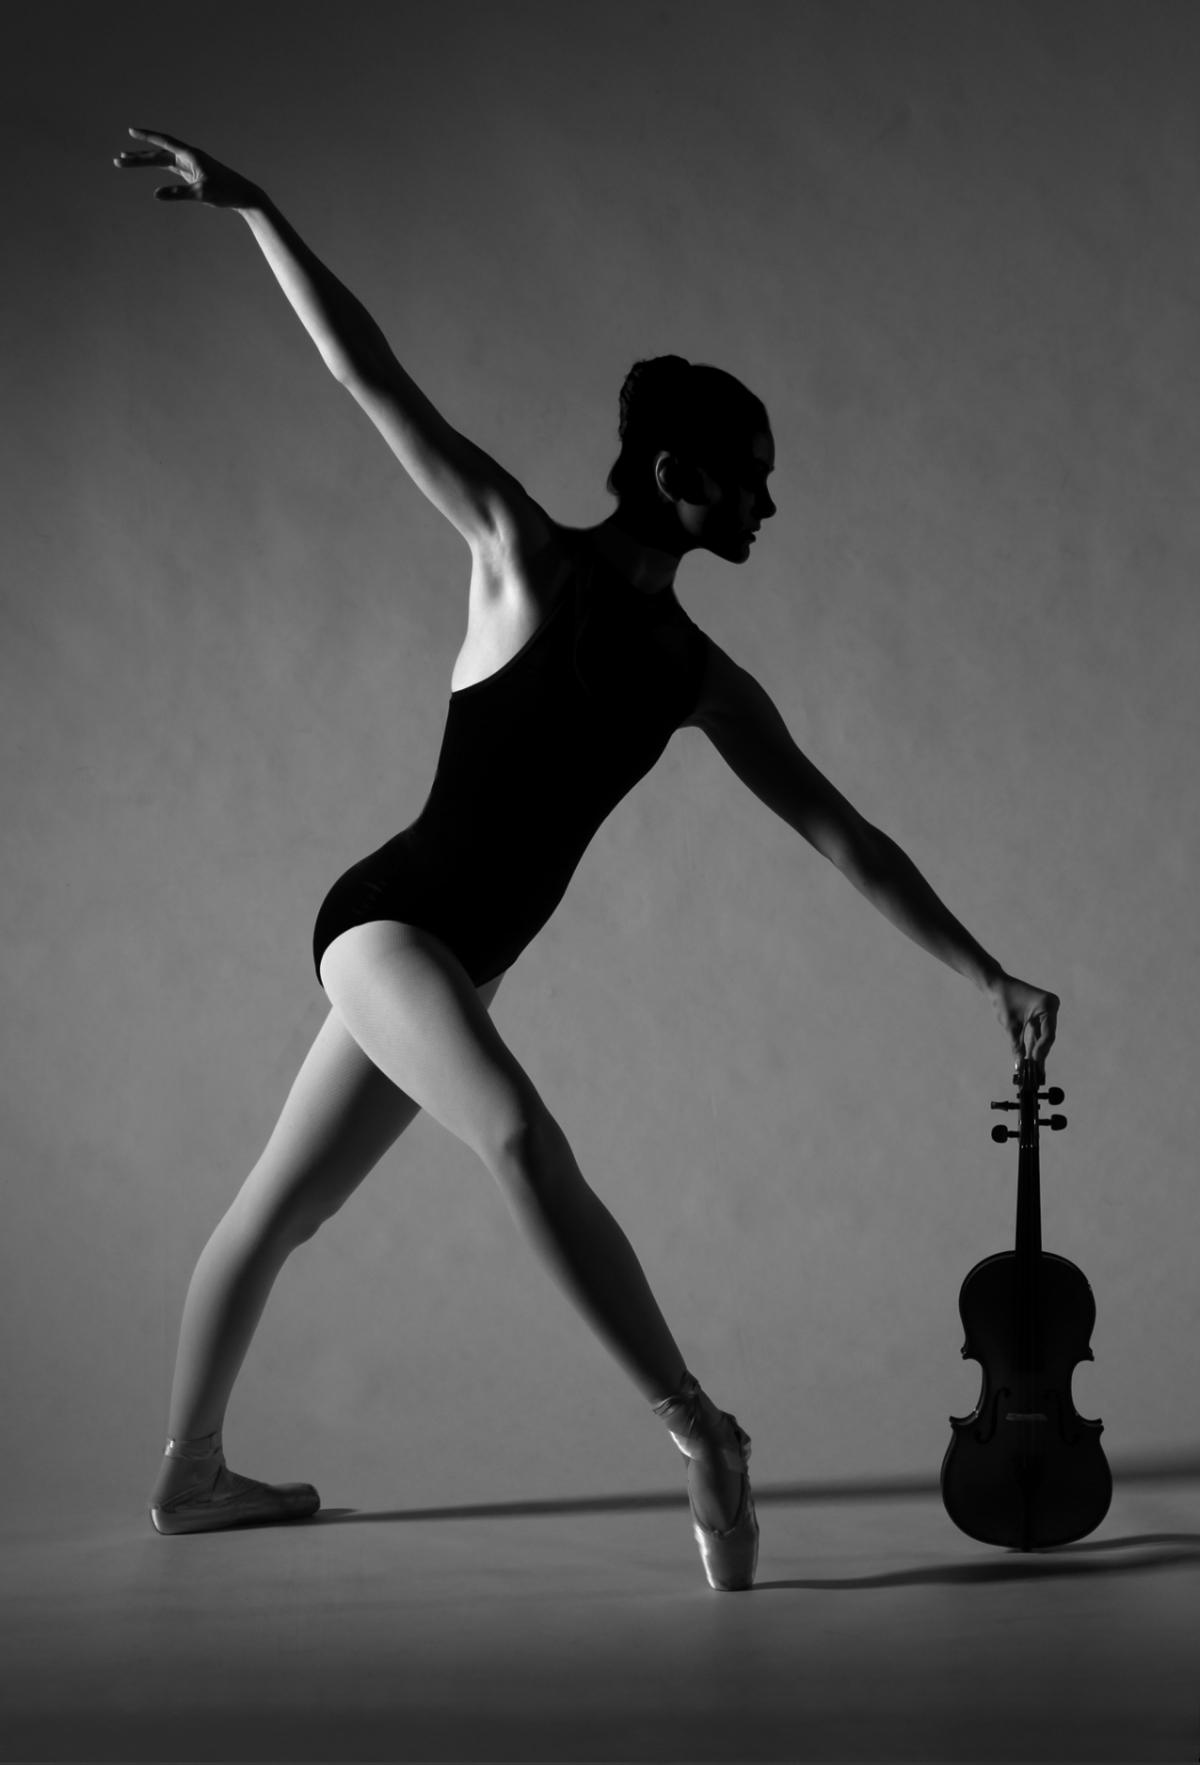 Miro Magloire: image courtesy of Kristin Linder